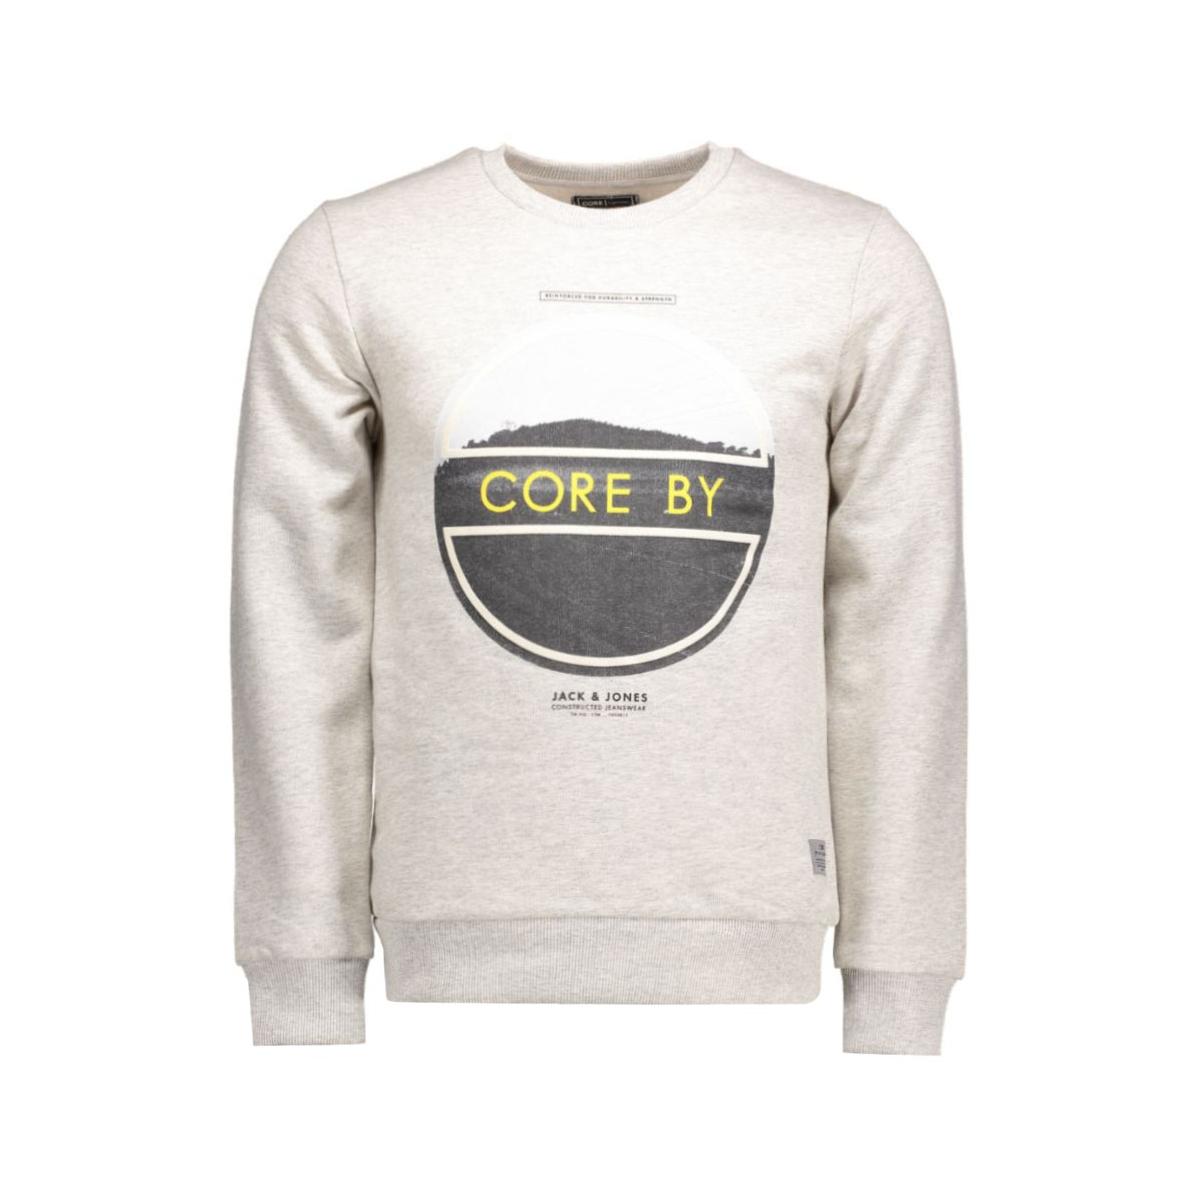 jjcobrag sweat crew neck 12106722 jack & jones sweater treated white